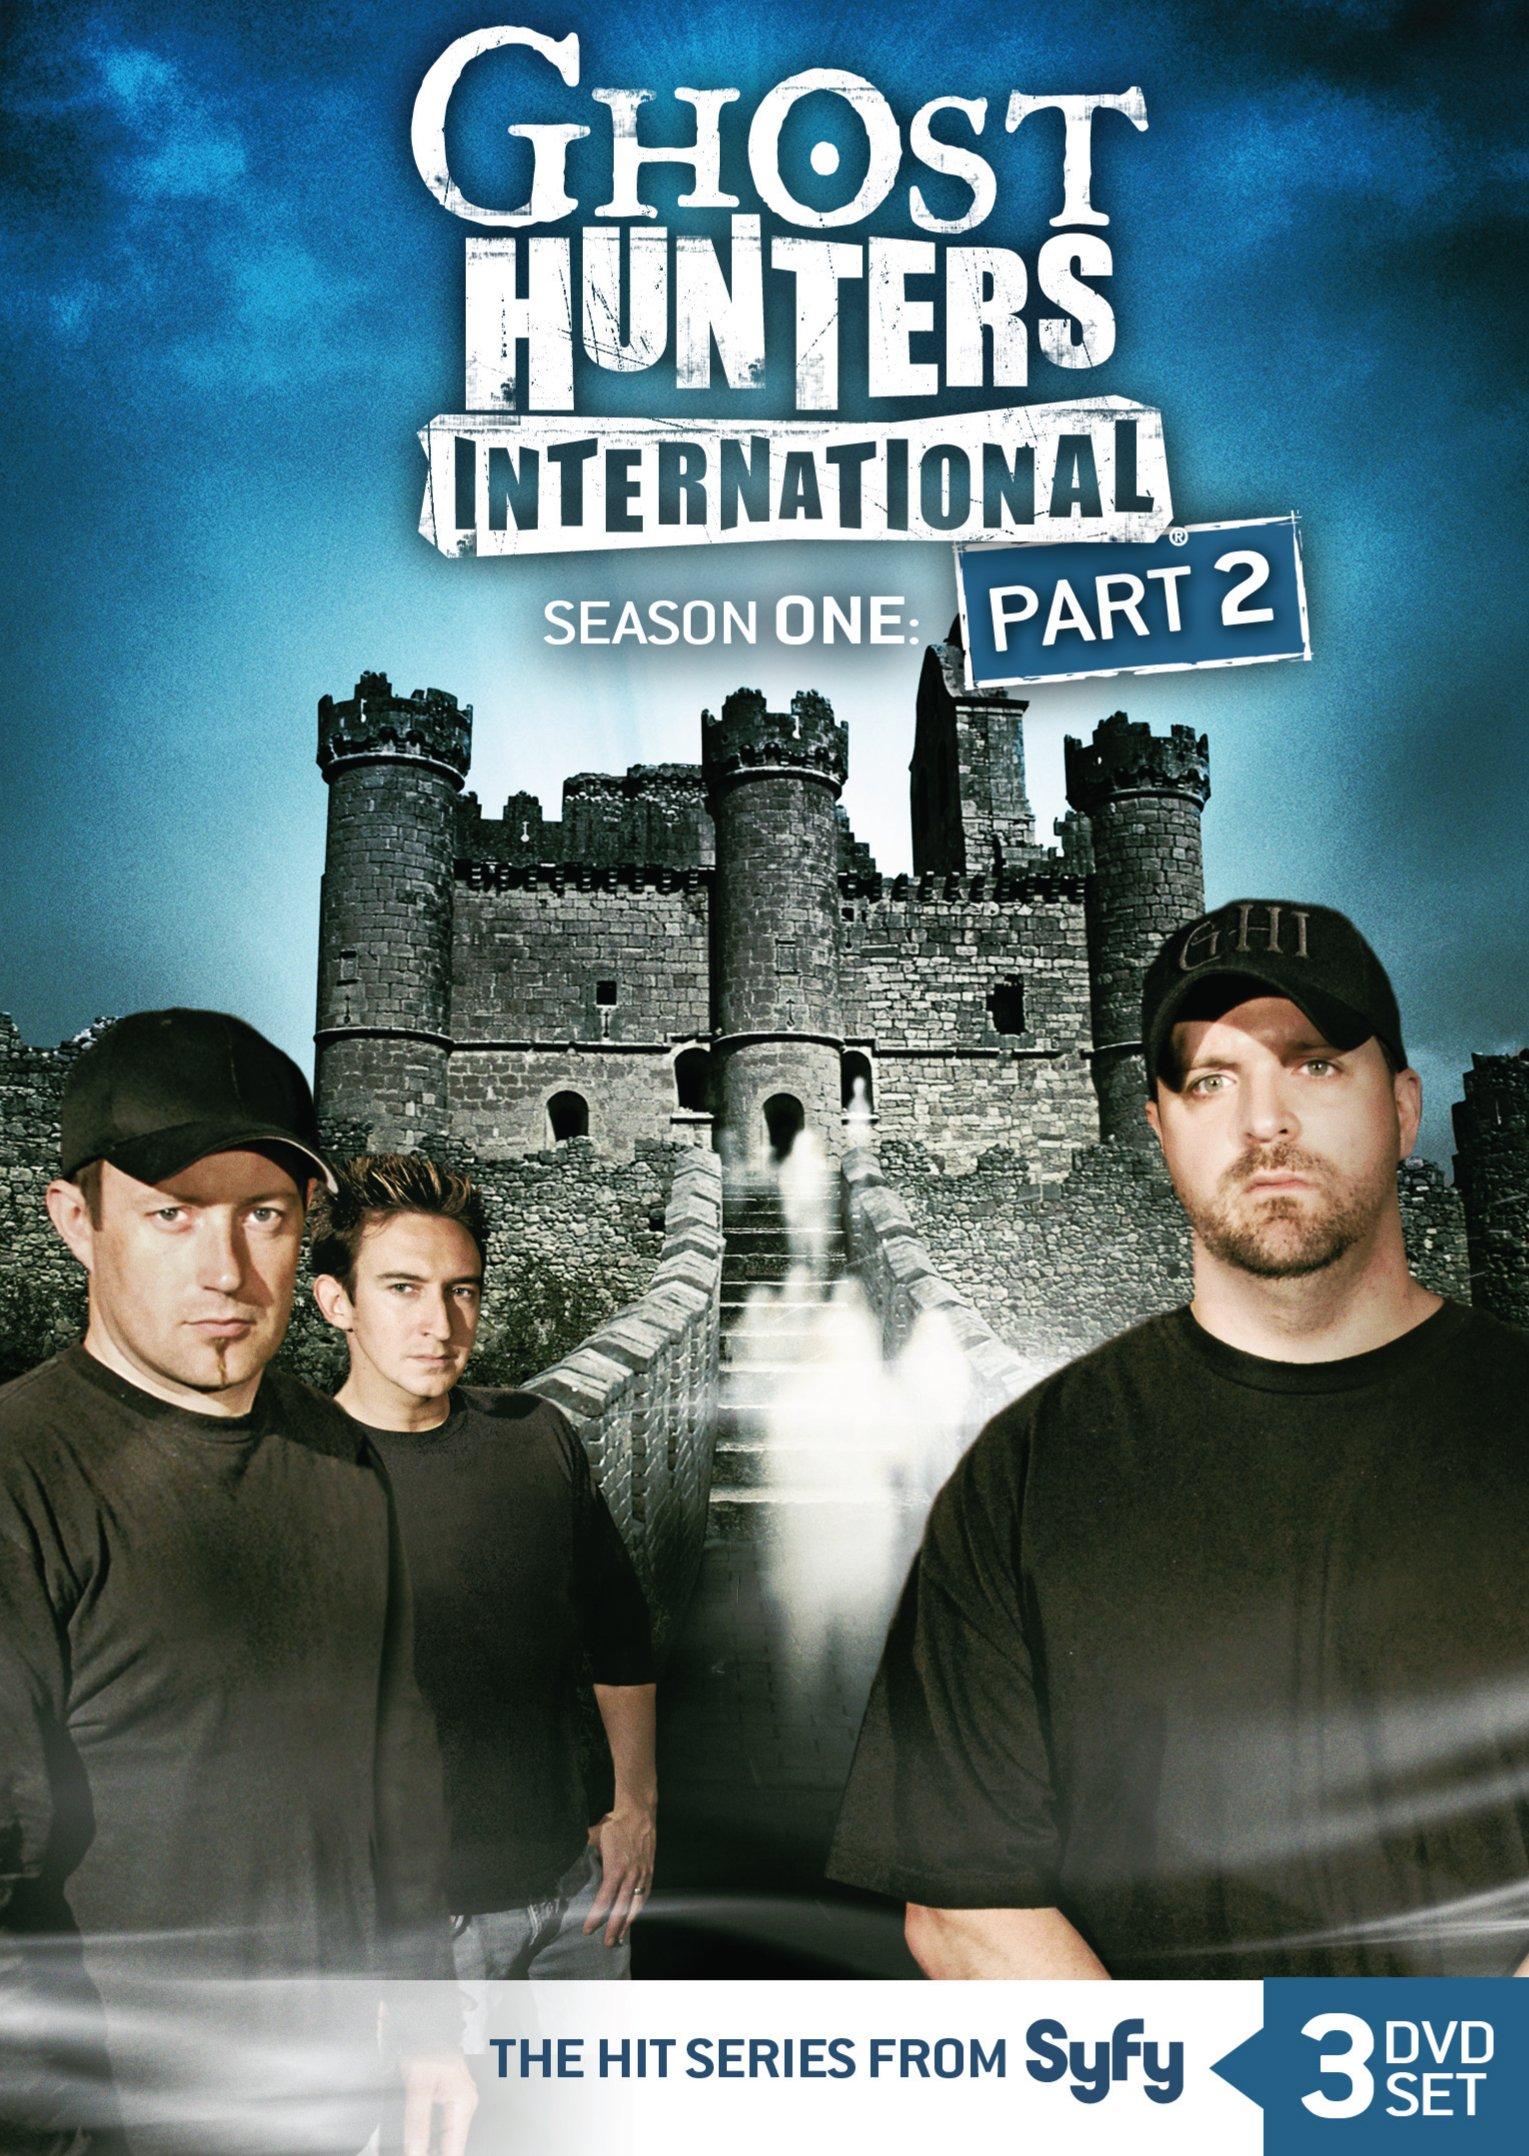 Ghost Hunters International: Season 1 Part 2 by IMAGE ENTERTAINMENT